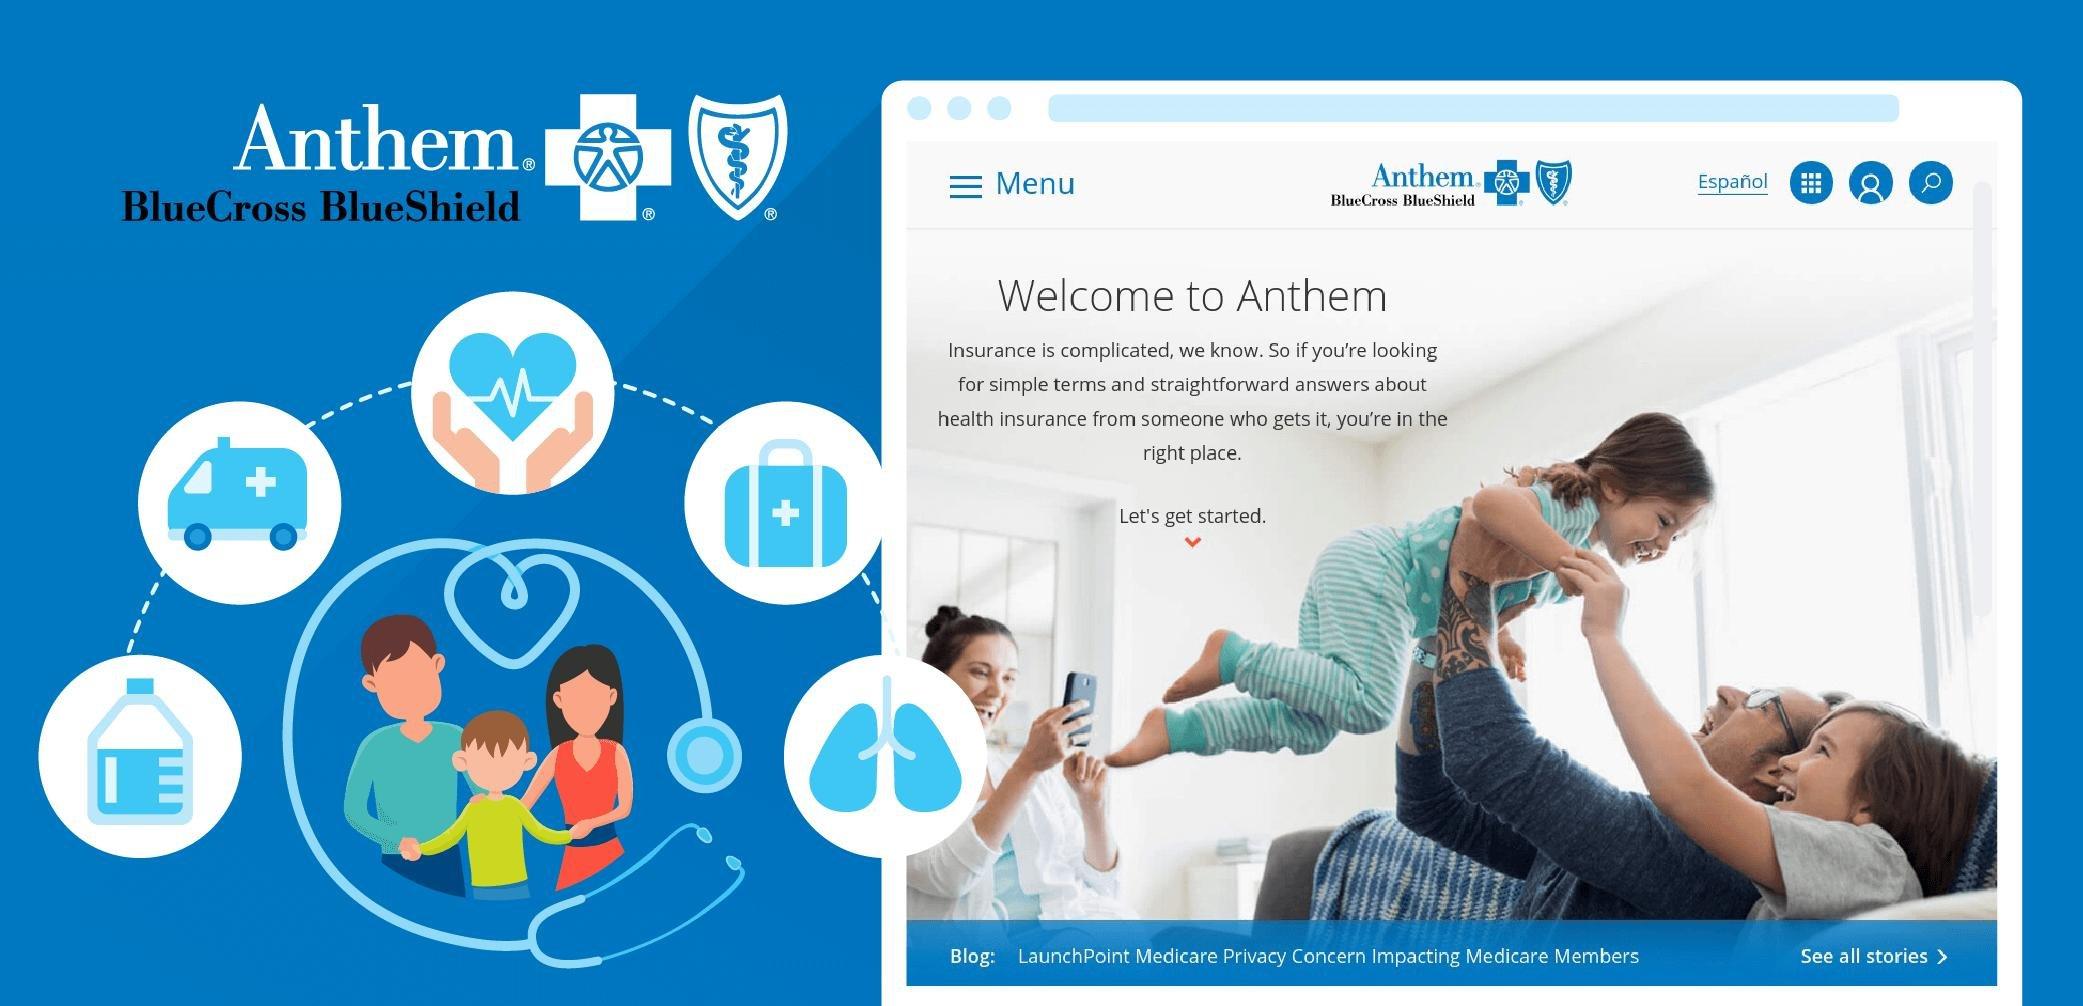 Anthem Blue Cross Blue Shield Diabetic Supplies ...